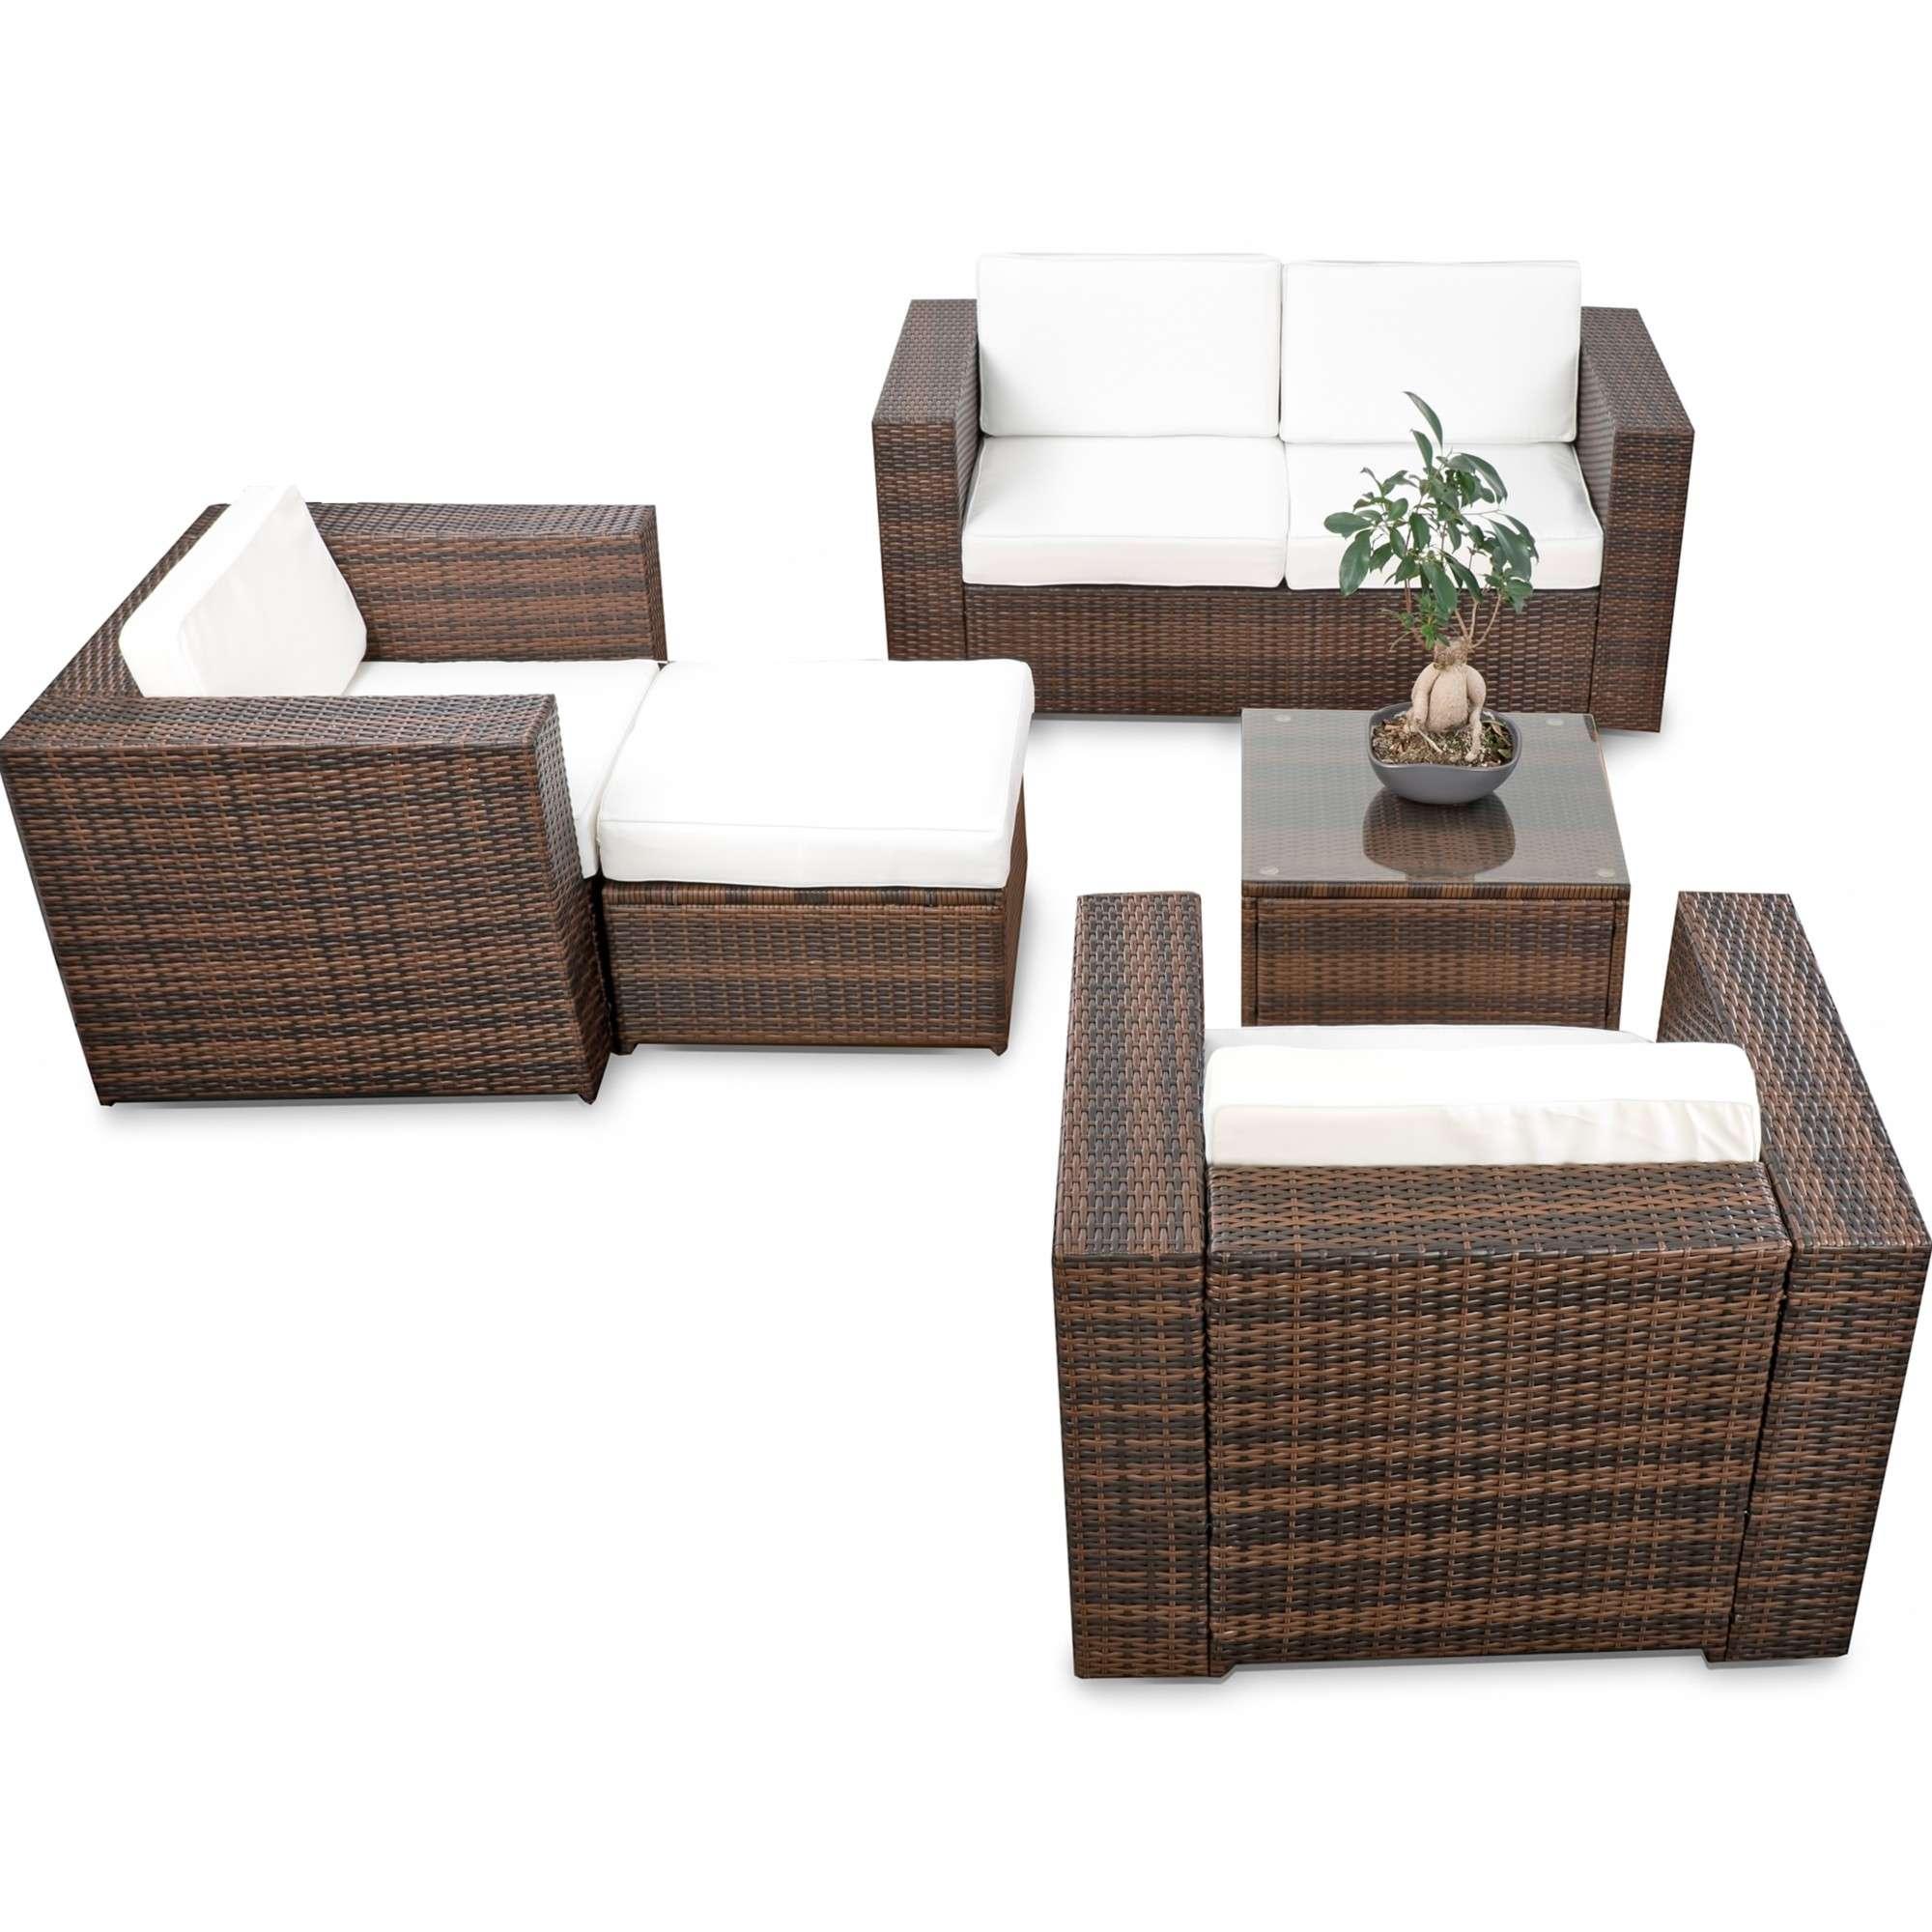 Tolle Gartenmoebel Holz Guenstig Schema - Garten-Design-Ideen